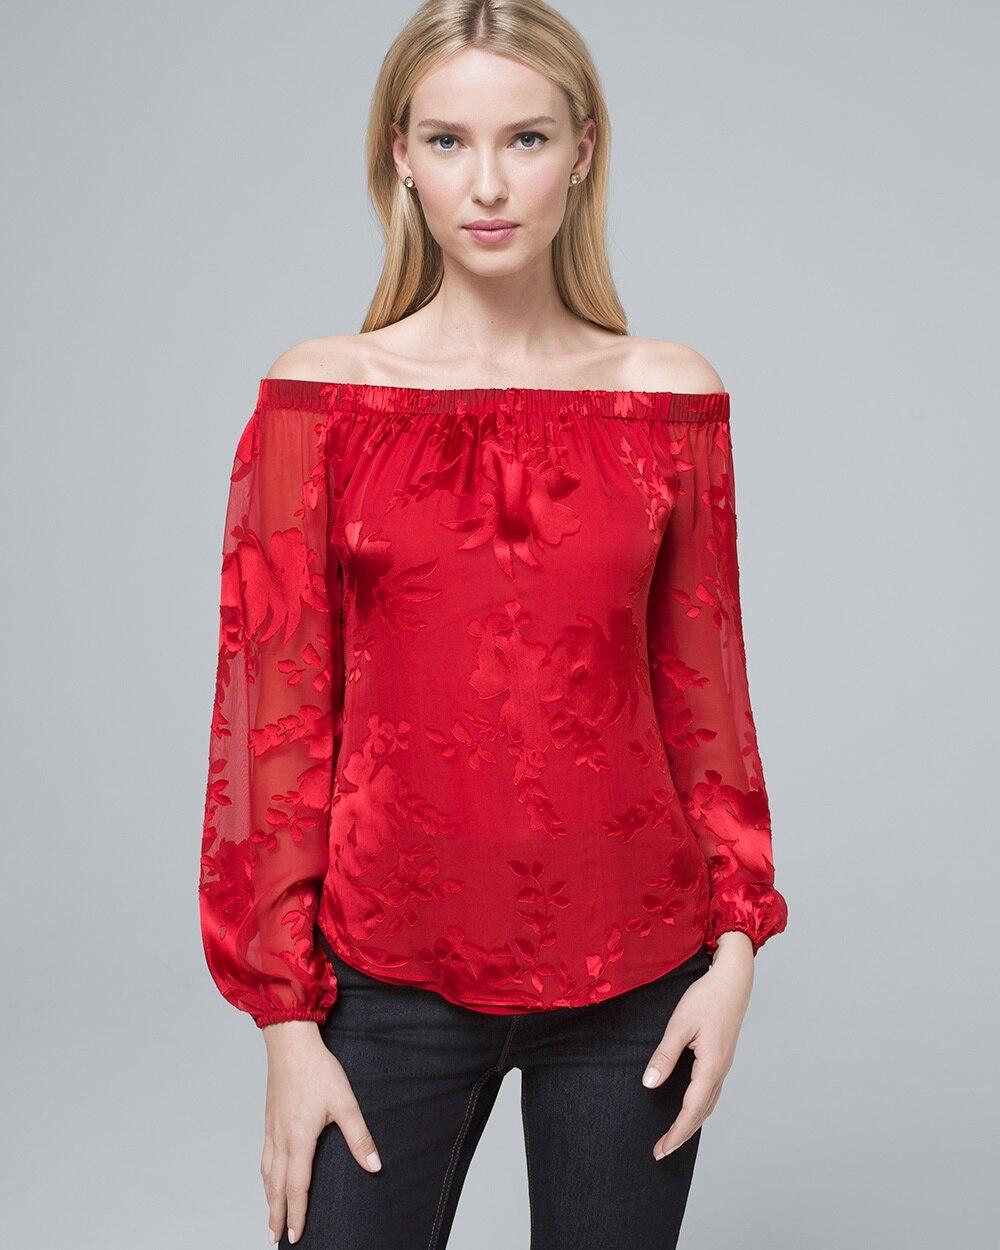 9bac301f0e535 Silk-Blend Floral Burnout Off-the-Shoulder Blouse - White House Black Market